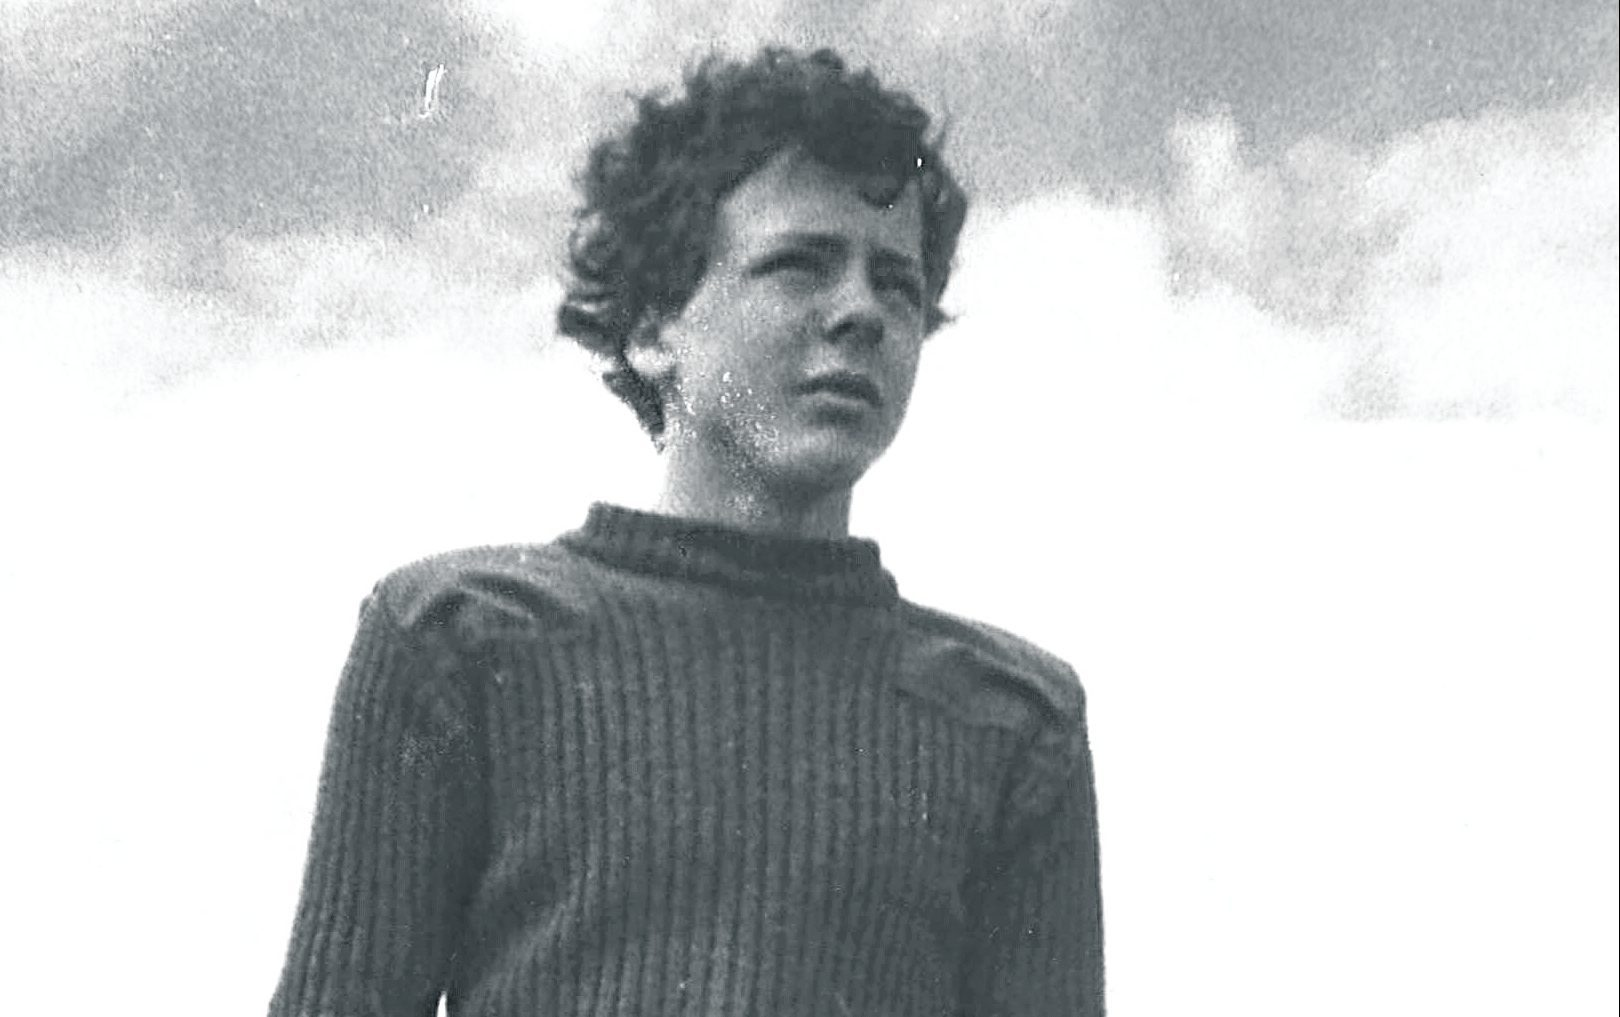 Robert Adaway